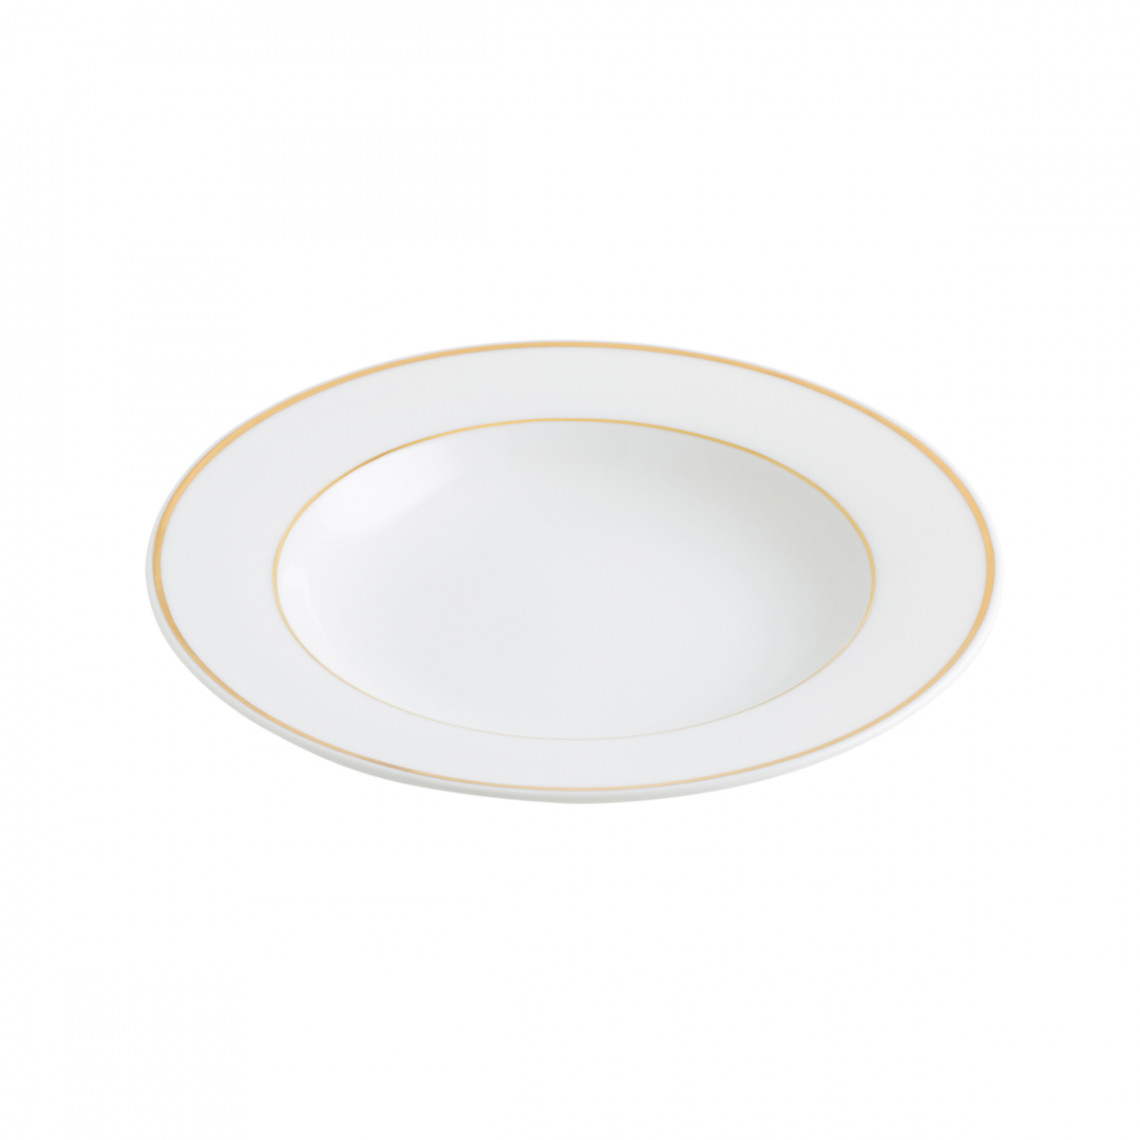 Assiette creuse Filet Or (Ø23)